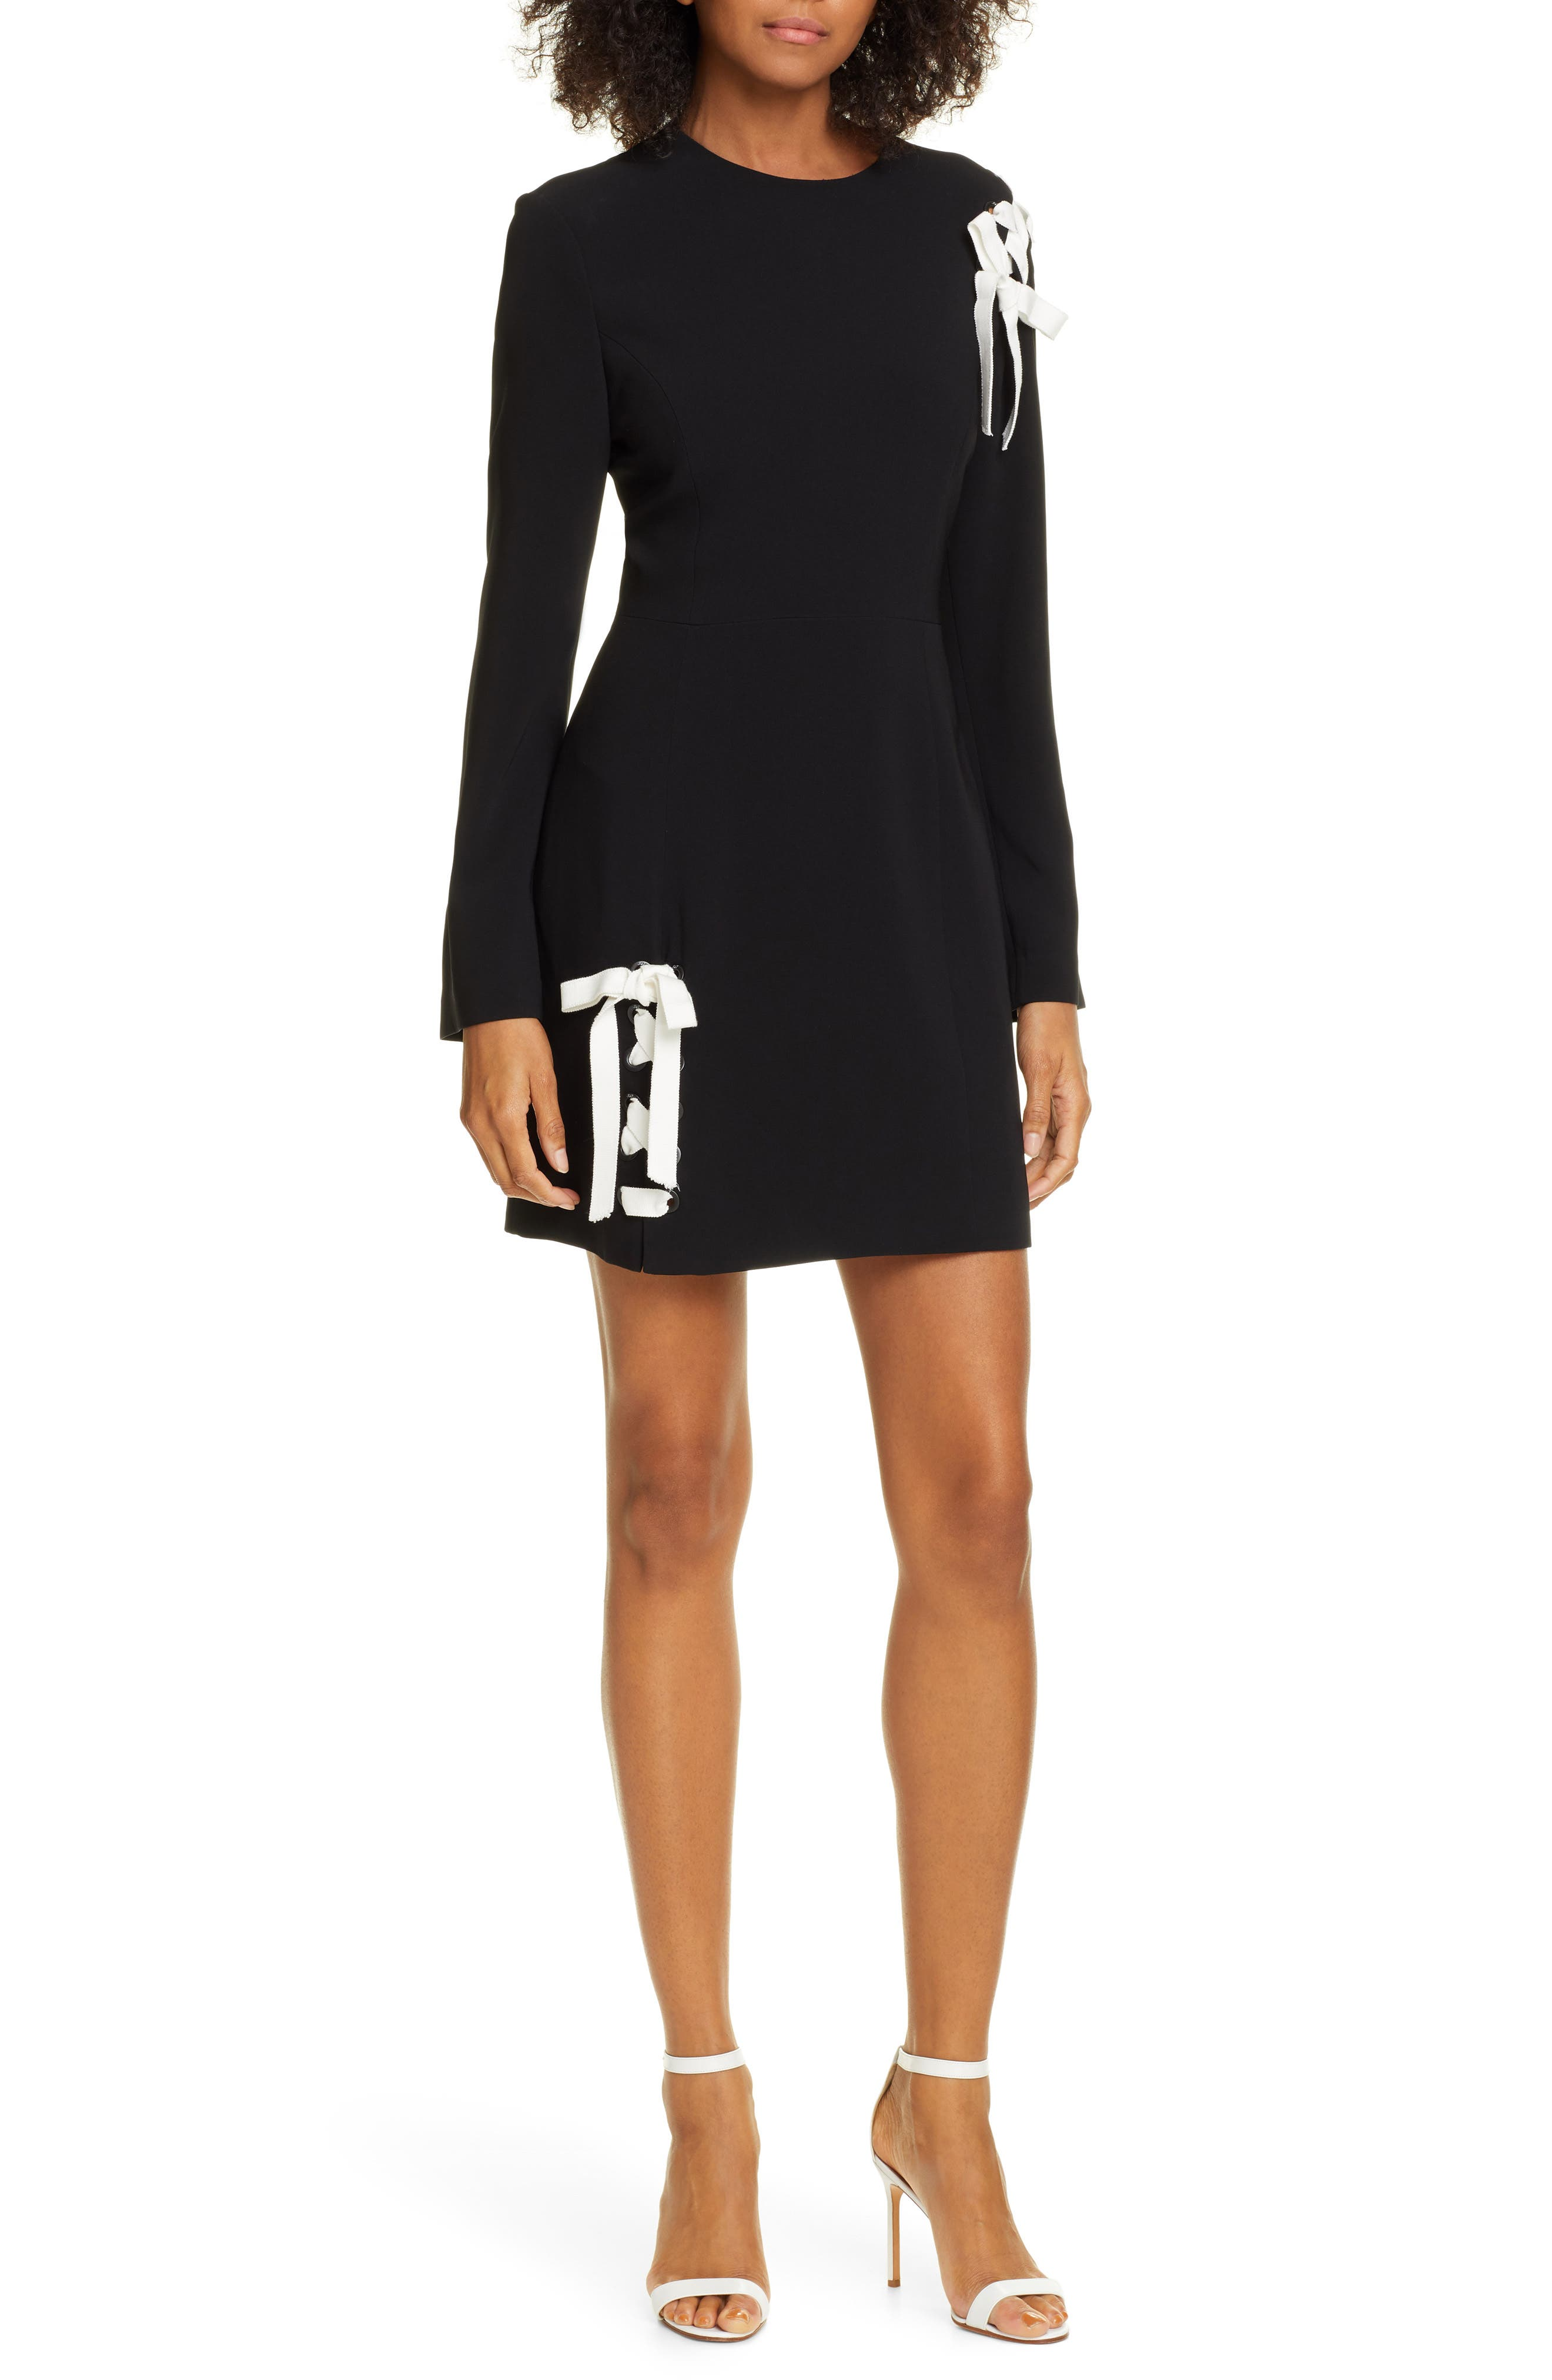 Cinq A Sept Izella Lace-Up Long Sleeve Dress, Black